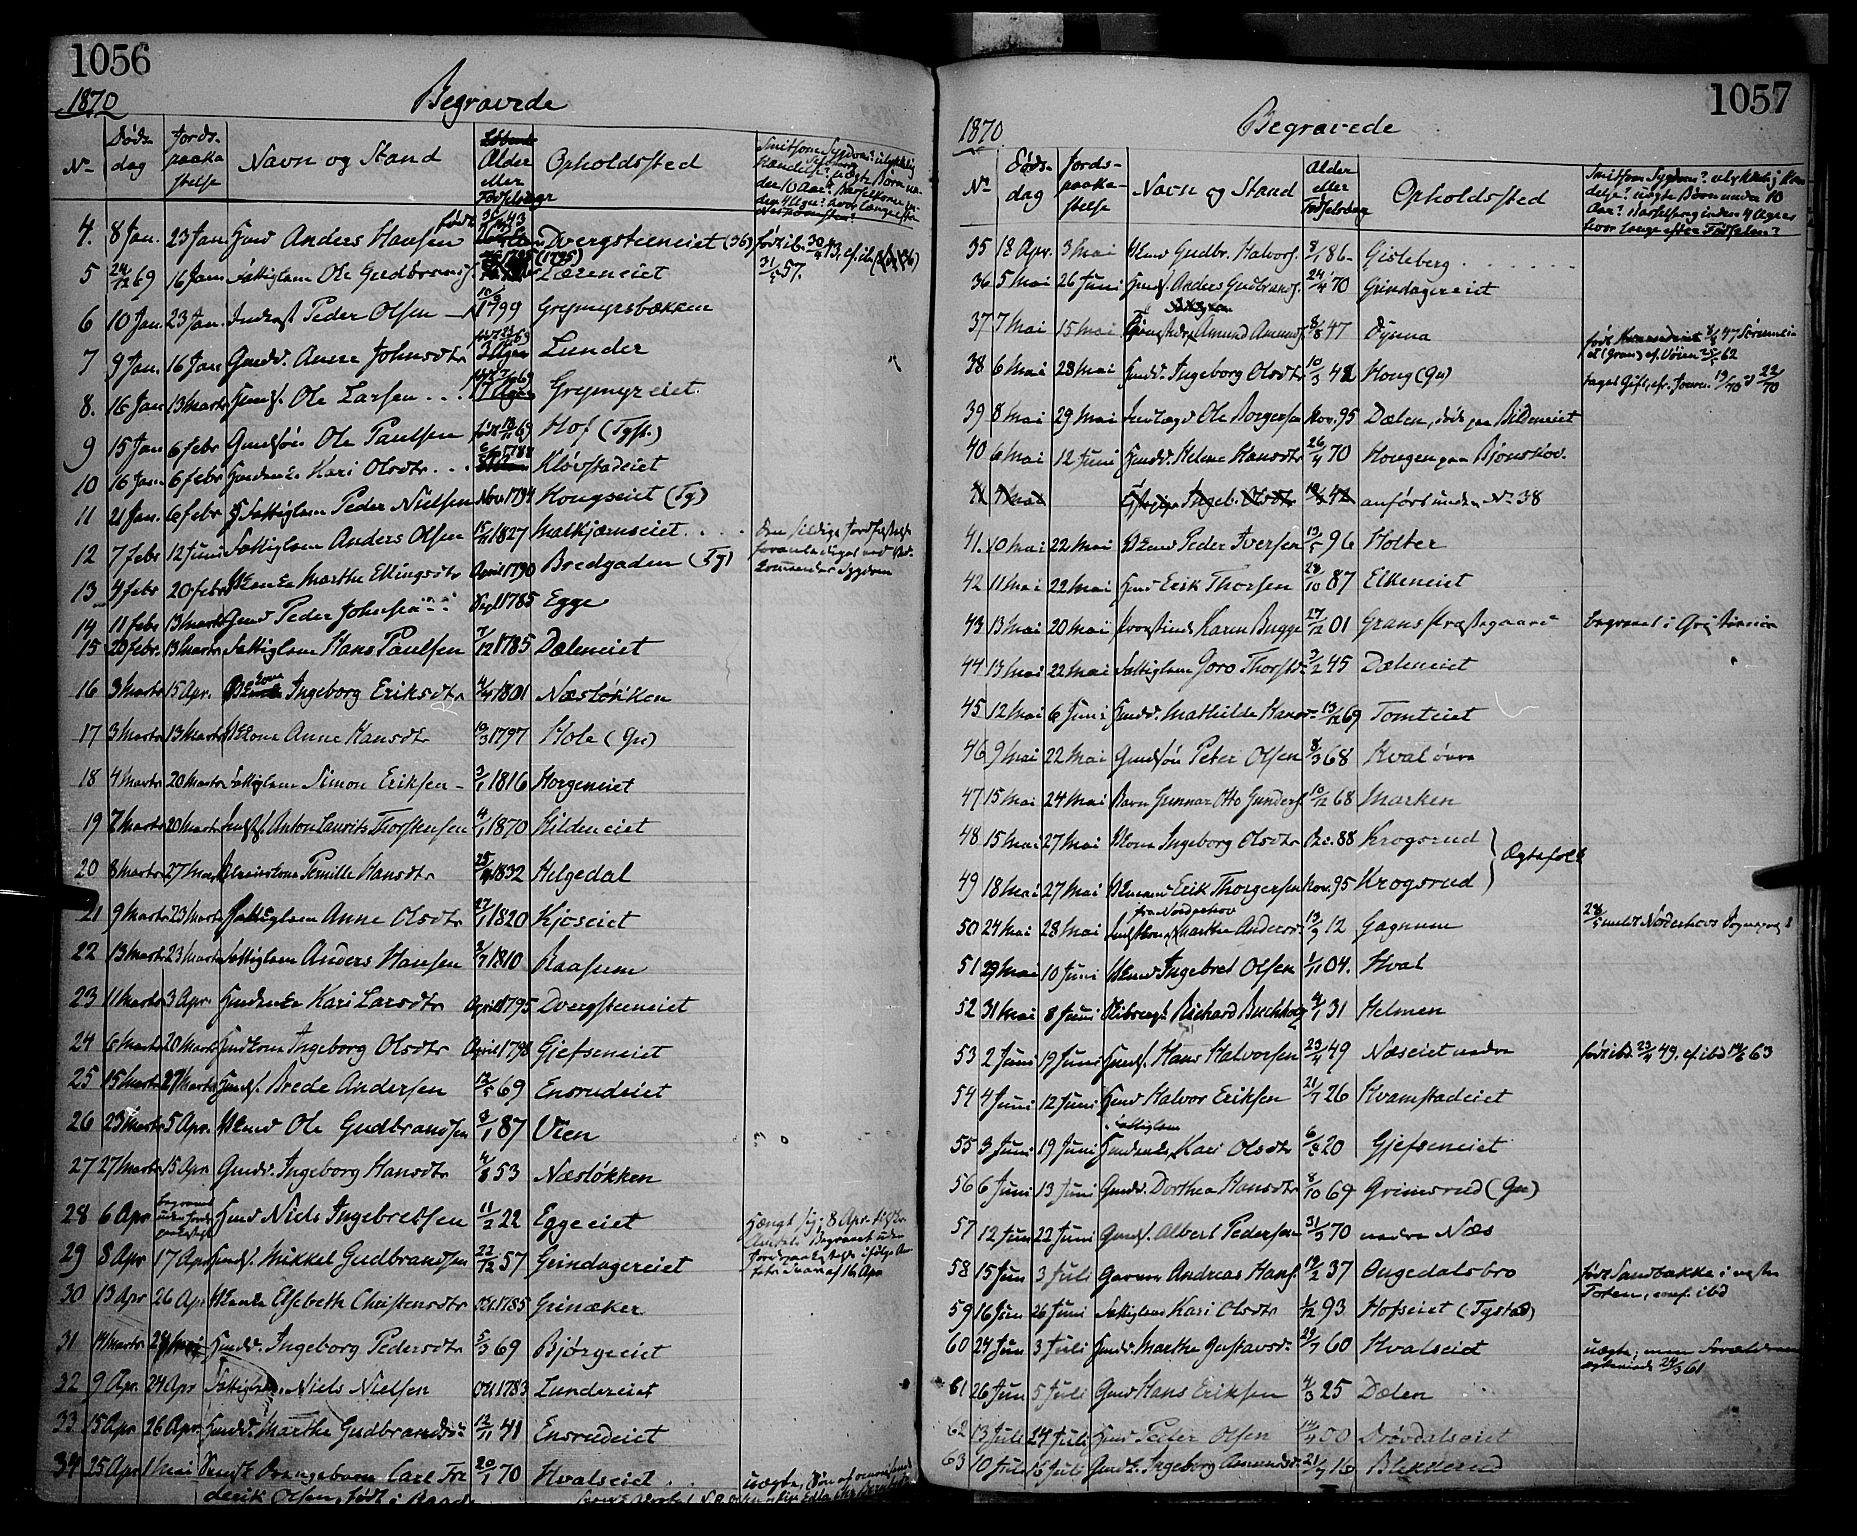 SAH, Gran prestekontor, Ministerialbok nr. 12, 1856-1874, s. 1056-1057